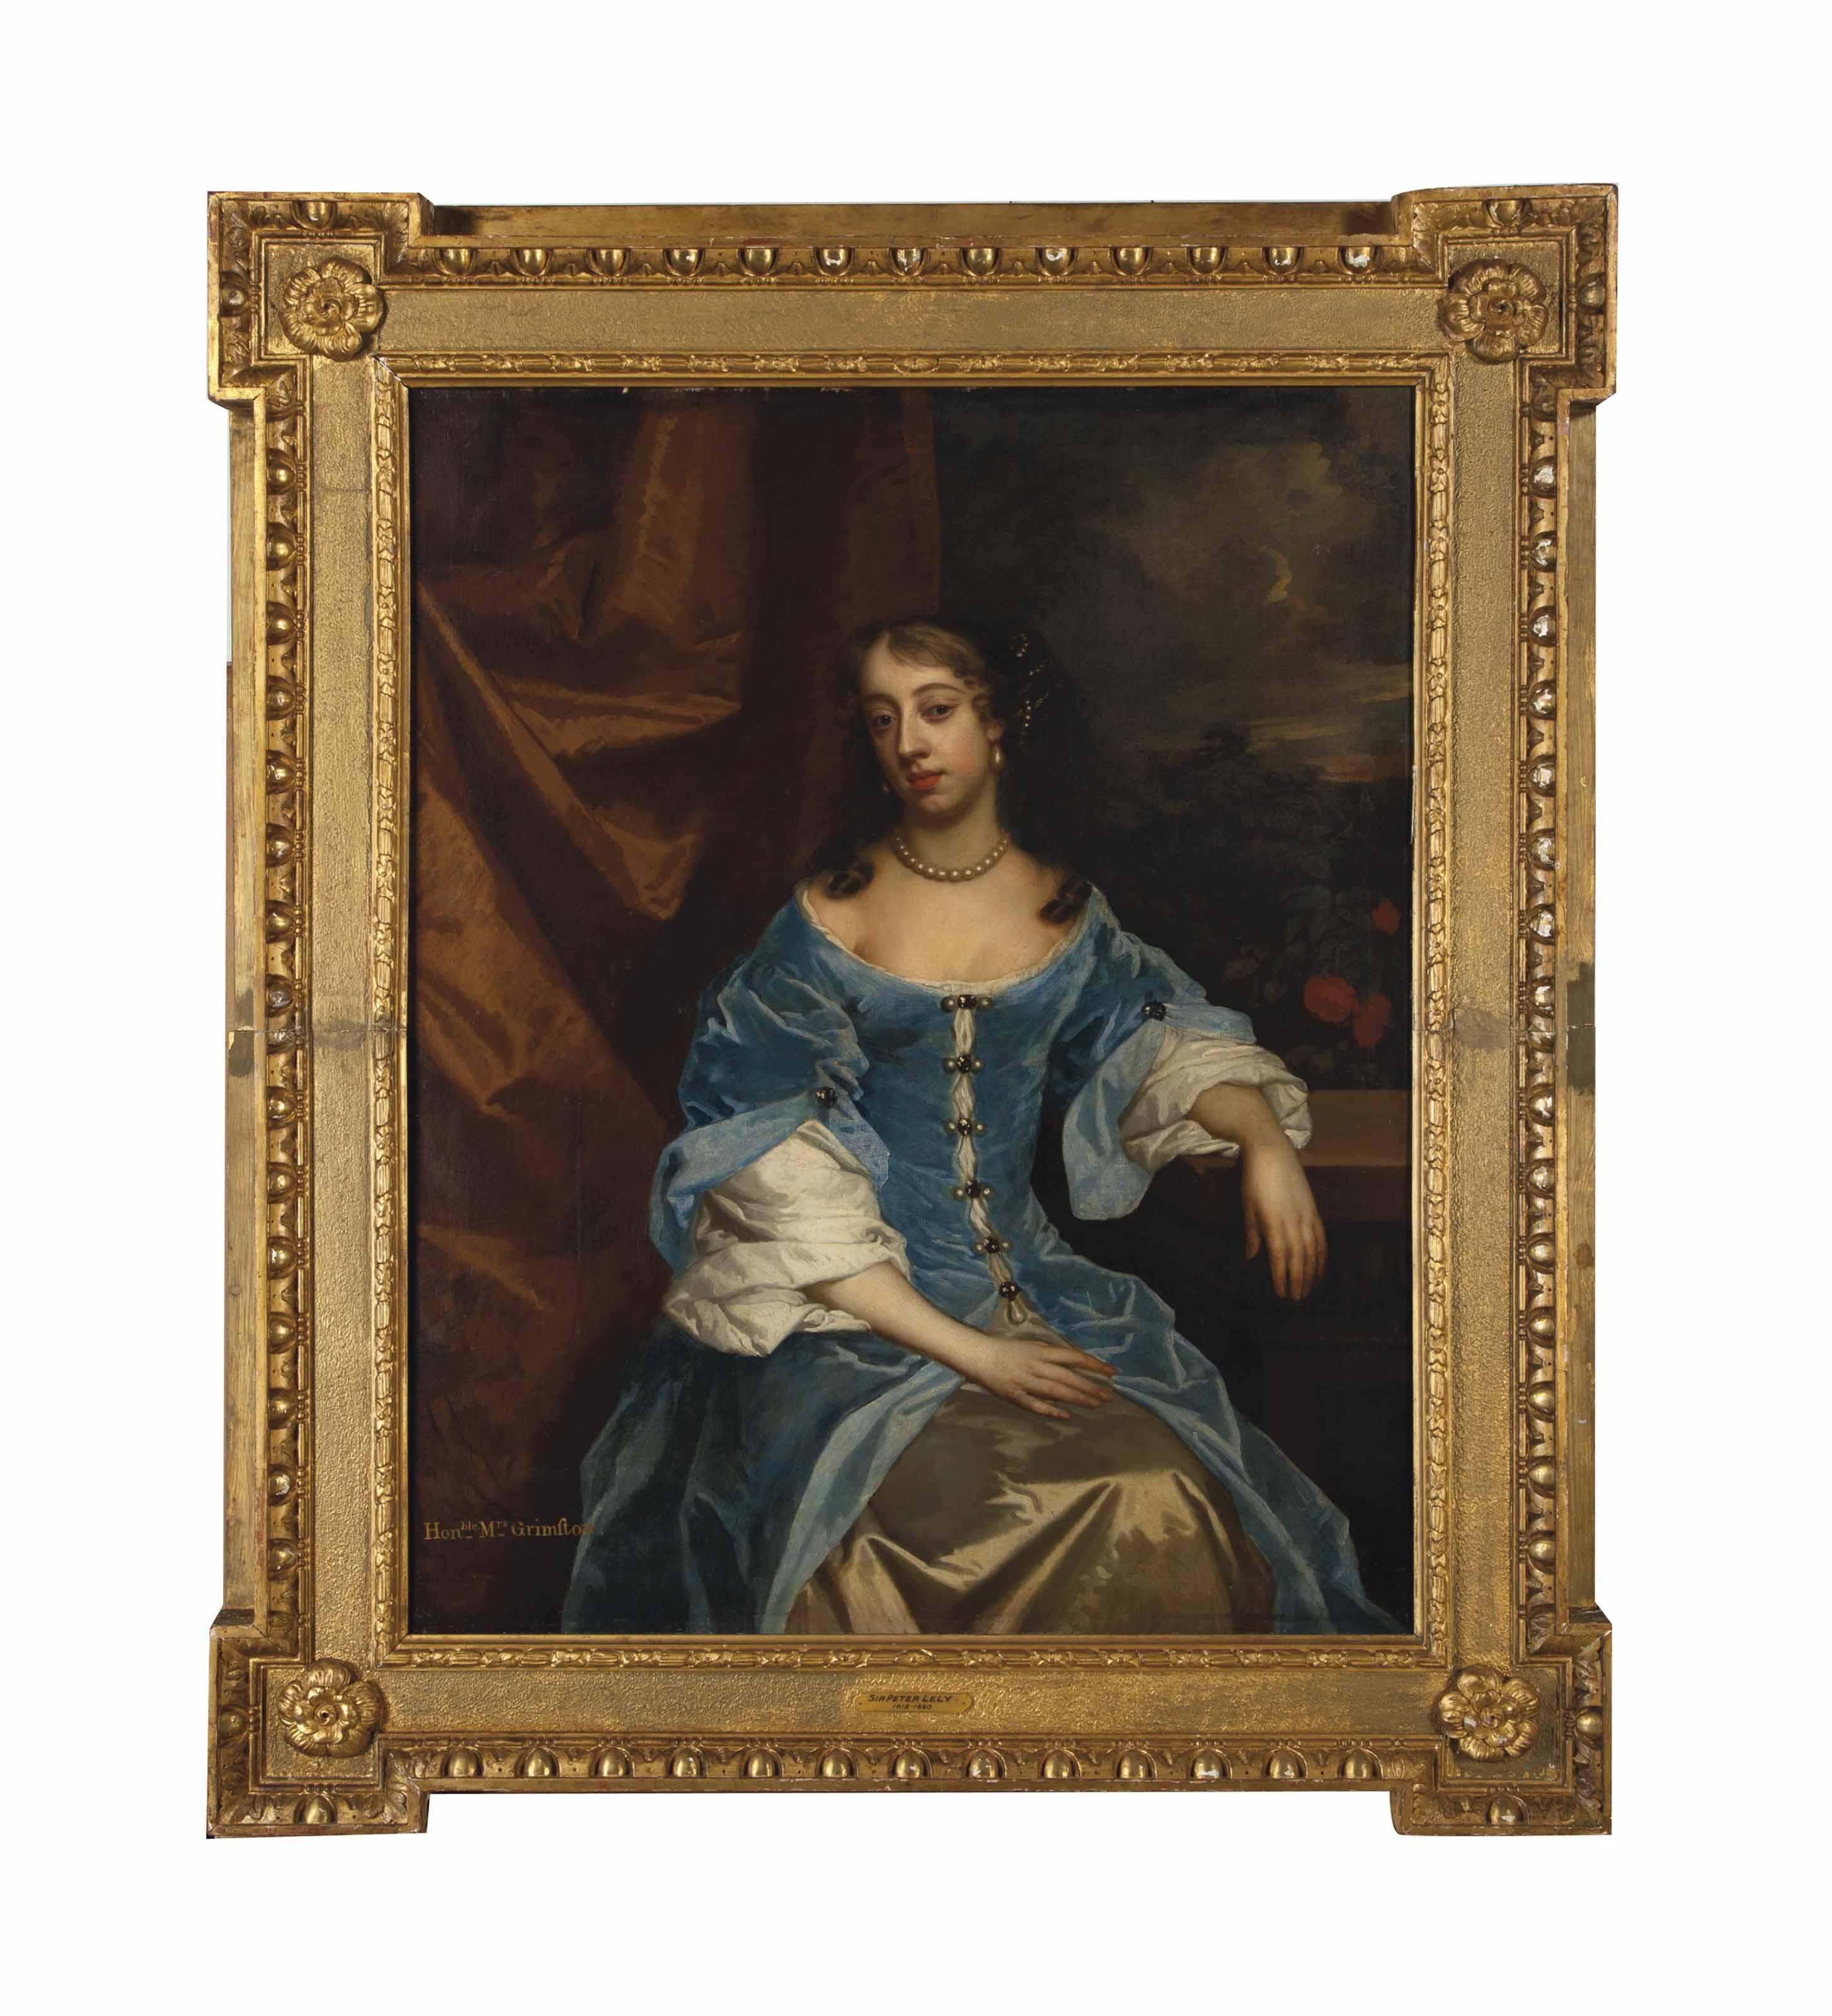 Portrait of the Hon. Mrs Grimston, Afterwards Lady Elizabeth Grimston, in a blue dress, resting her left arm on a pedestal